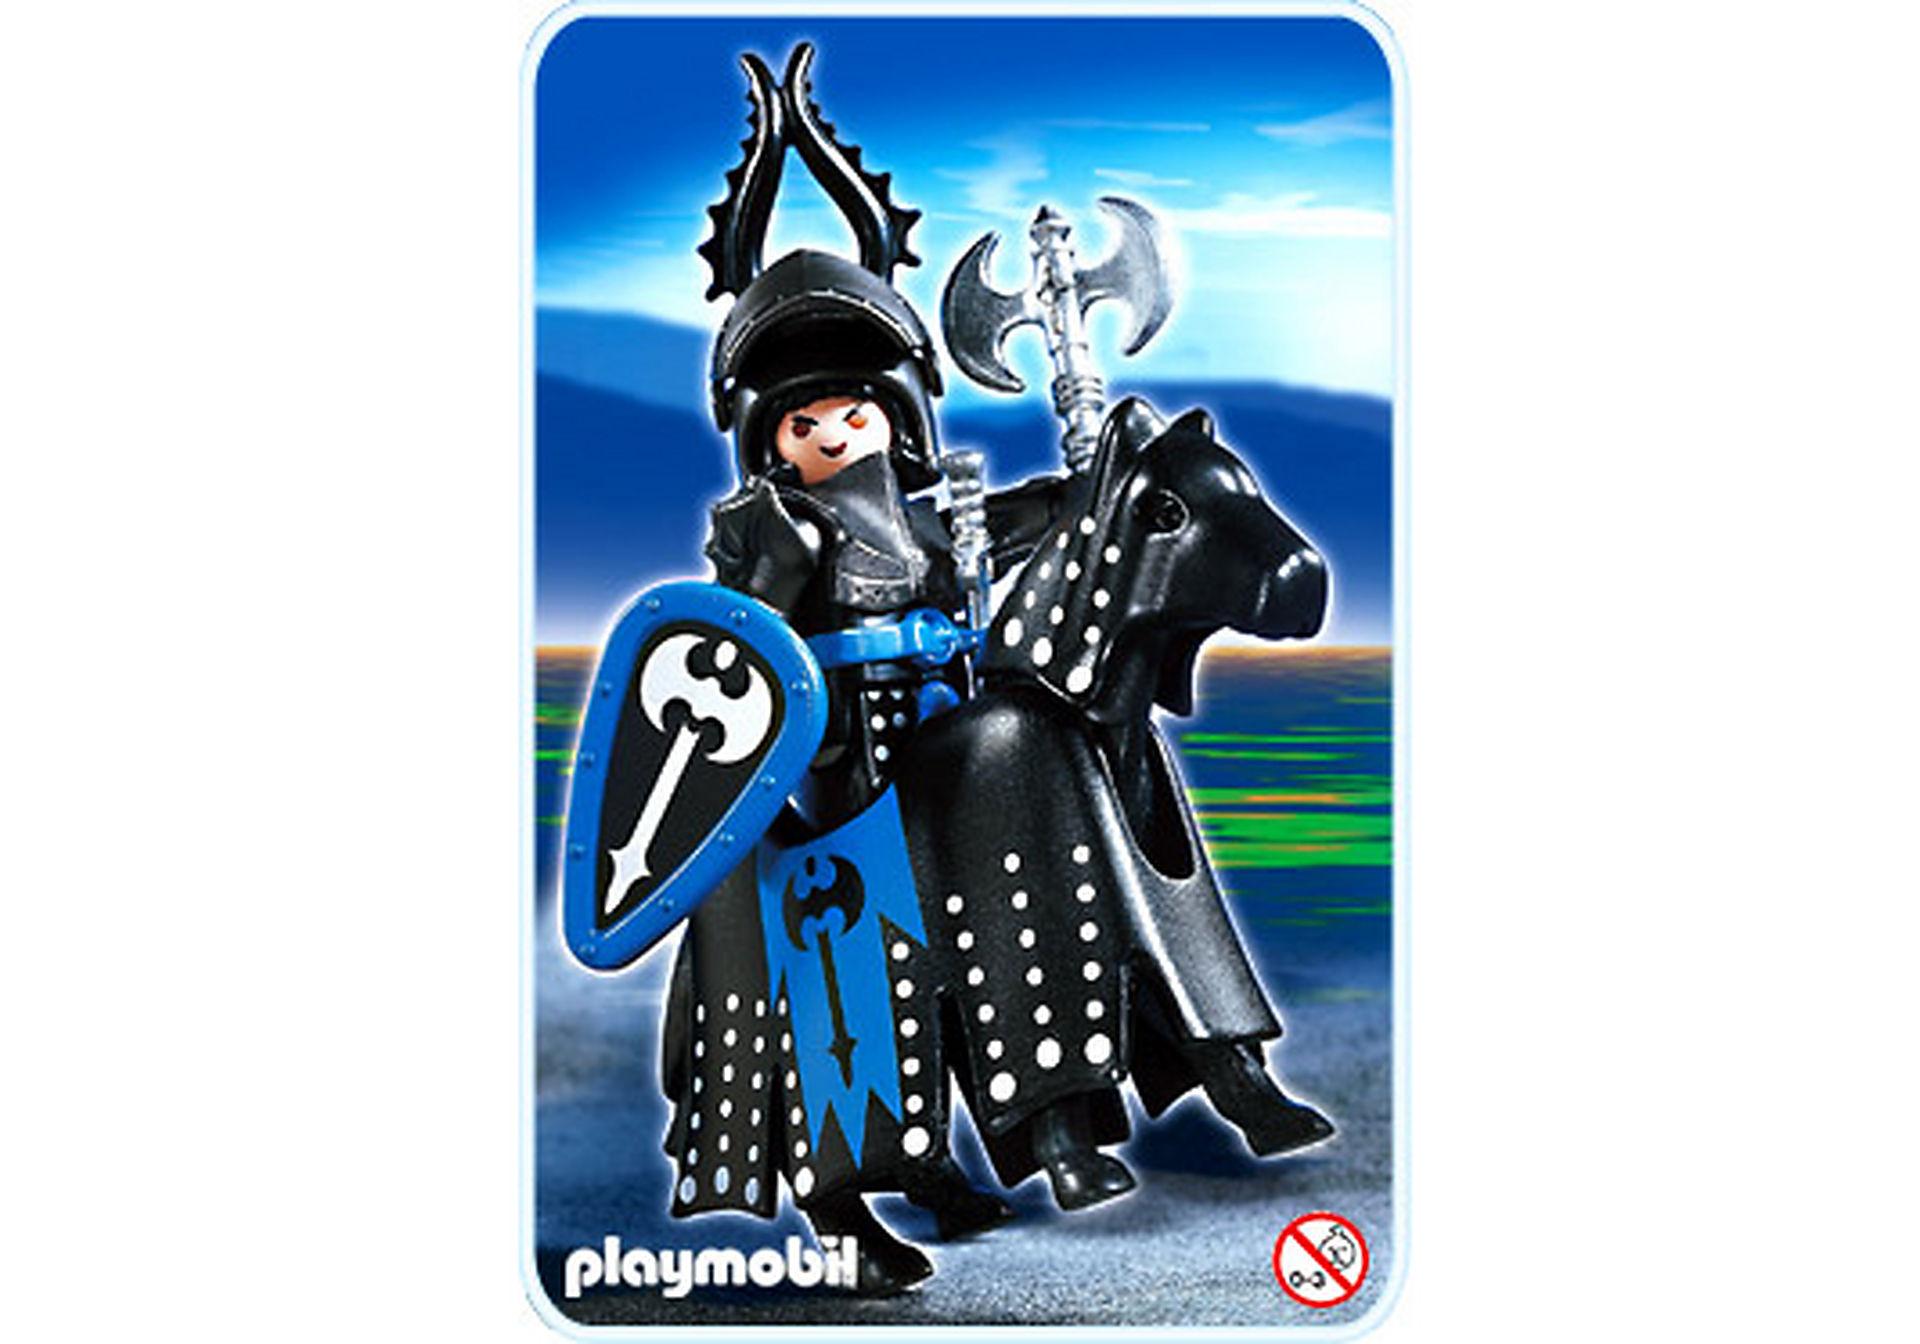 http://media.playmobil.com/i/playmobil/3315-B_product_detail/Schwarzer Ritter